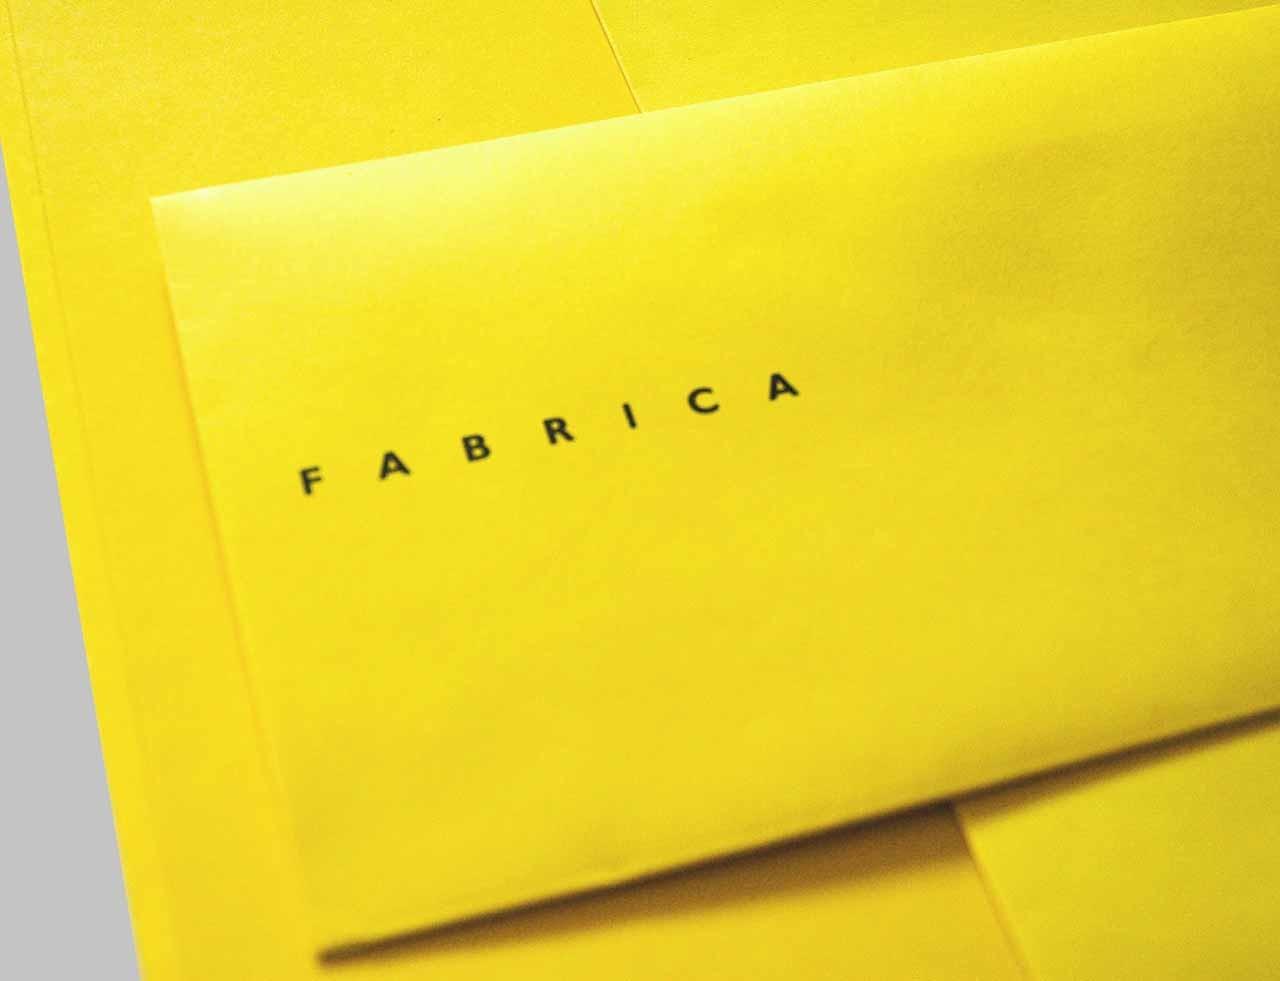 Isotype Fabrica identity